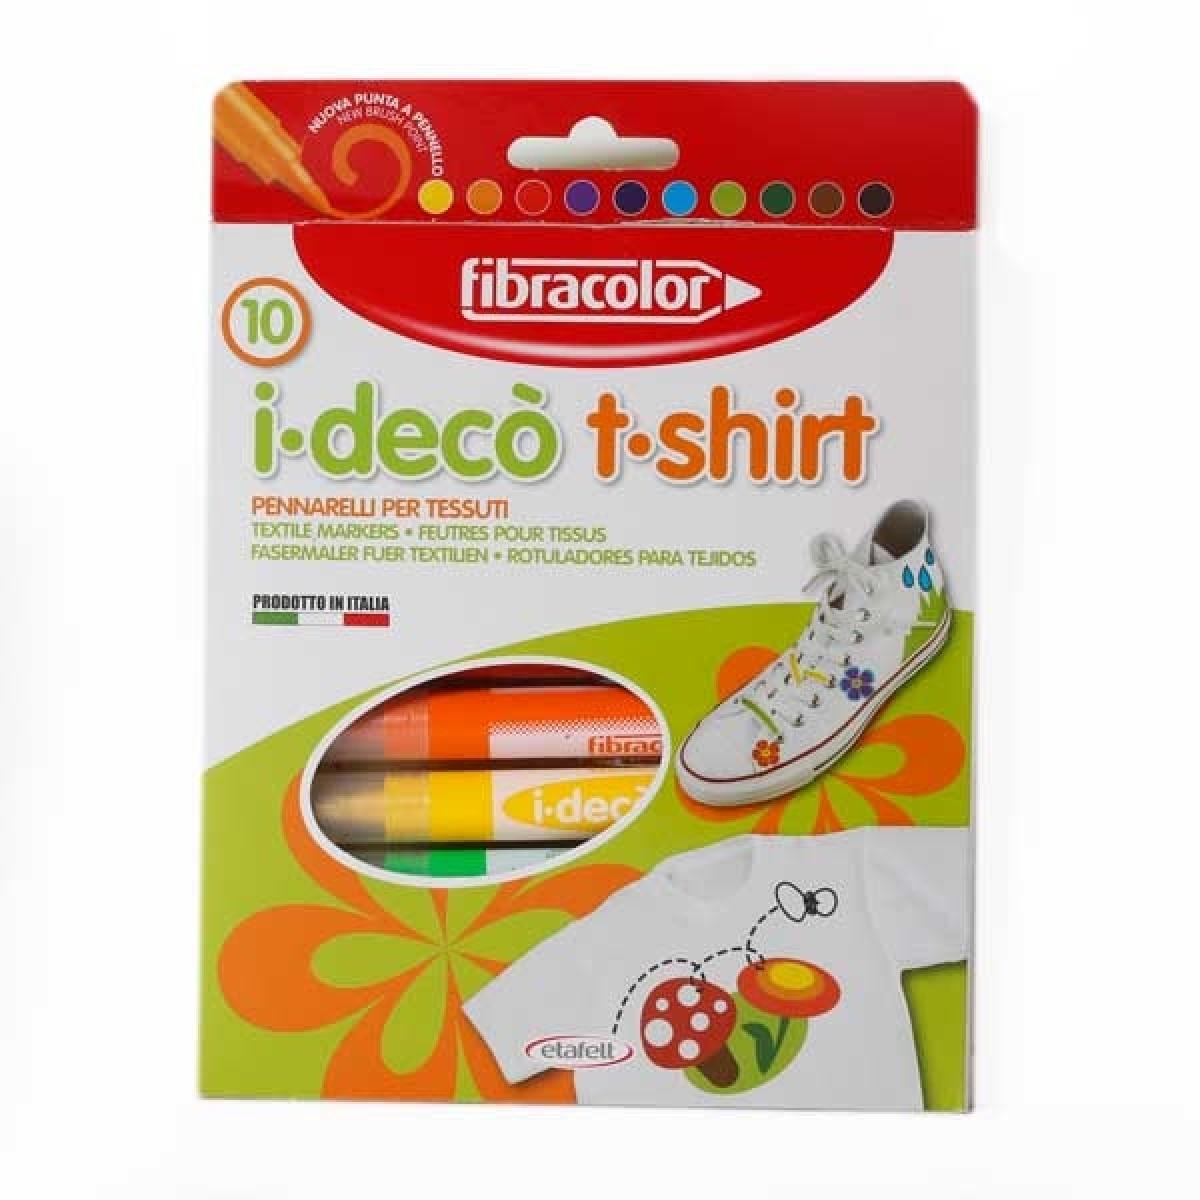 Fibracolor Μαρκαδόροι Textile (10 Τεμ.) Μαρκαδόροι